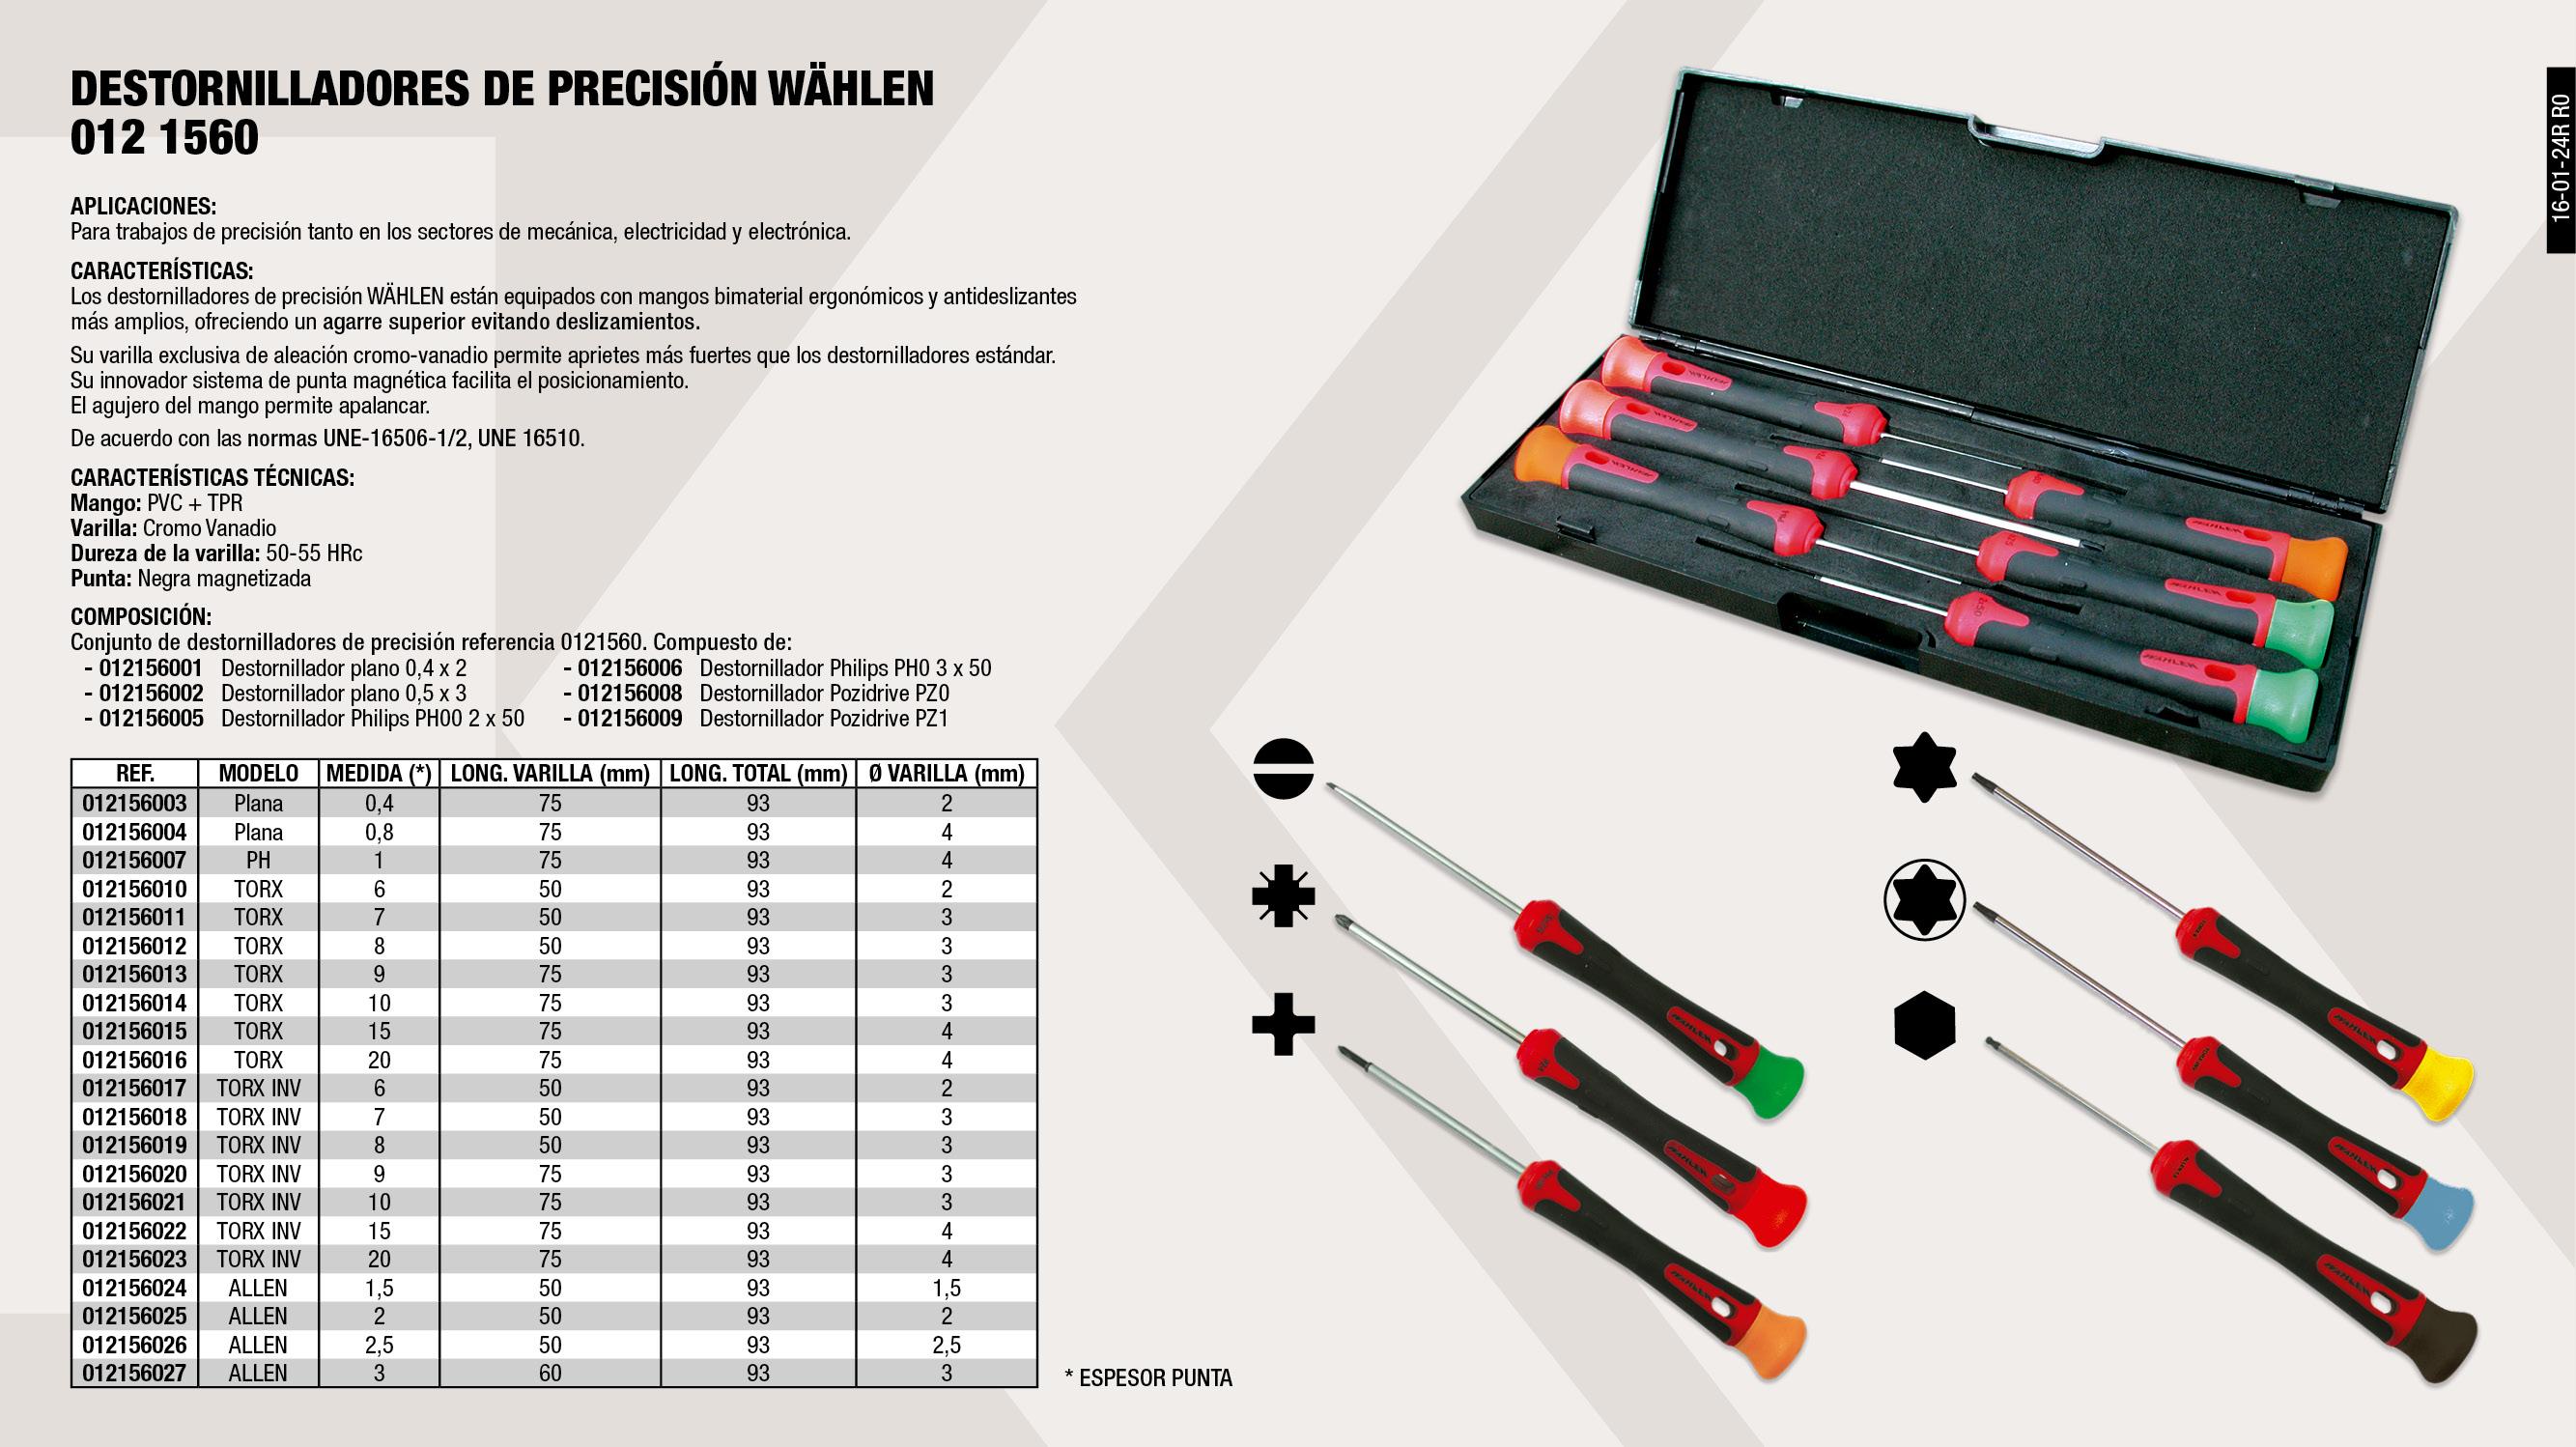 DESTOR PREC TORX T-10X3X75                                  ,  DESTOR PREC TORX T-20X4X75                                  ,  DESTOR PREC PLANO 0.4X2X75                                  ,  DESTOR PREC TORX T-6X2X50                                   ,  DESTOR PREC TORX T-8X3X50                                   ,  DESTOR PREC PZ                                              ,  DESTOR PREC PLANO 0.4X2X50                                  ,  DESTOR PREC TORX INV TT8-3X50                               ,  CONJUNTO DESTORN PREC                                       ,  DESTOR PREC PLANO 0.8X4X75                                  ,  DESTOR PREC TORX INV TT9X3X75                               ,  DESTOR PREC TORX INV TT20X4X75                              ,  DESTOR PREC TORX INV TT10X3X75                              ,  DESTOR PREC ALLEN 2X50                                      ,  DESTOR PREC TORX T-7X3X50                                   ,  DESTOR PREC PH 2X50                                         ,  DESTOR PREC PH 3X50                                         ,  DESTOR PREC TORX T-9X3X75                                   ,  DESTOR PREC PZ                                              ,  DESTOR PREC TORX INV TT-7X3X50                              ,  DESTOR PREC TORX INV TT15X4X75                              ,  DESTOR PREC ALLEN 3X60                                      ,  DESTOR PREC PLANO 0.5X3X75                                  ,  DESTOR PREC TORX T-15X4X75                                  ,  DESTOR PREC ALLEN 1.5X50                                    ,  DESTOR PREC TORX INV TT-6X2X50                              ,  DESTOR PREC ALLEN 2.5X50                                    ,  DESTOR PREC PH 4X75                                         ,